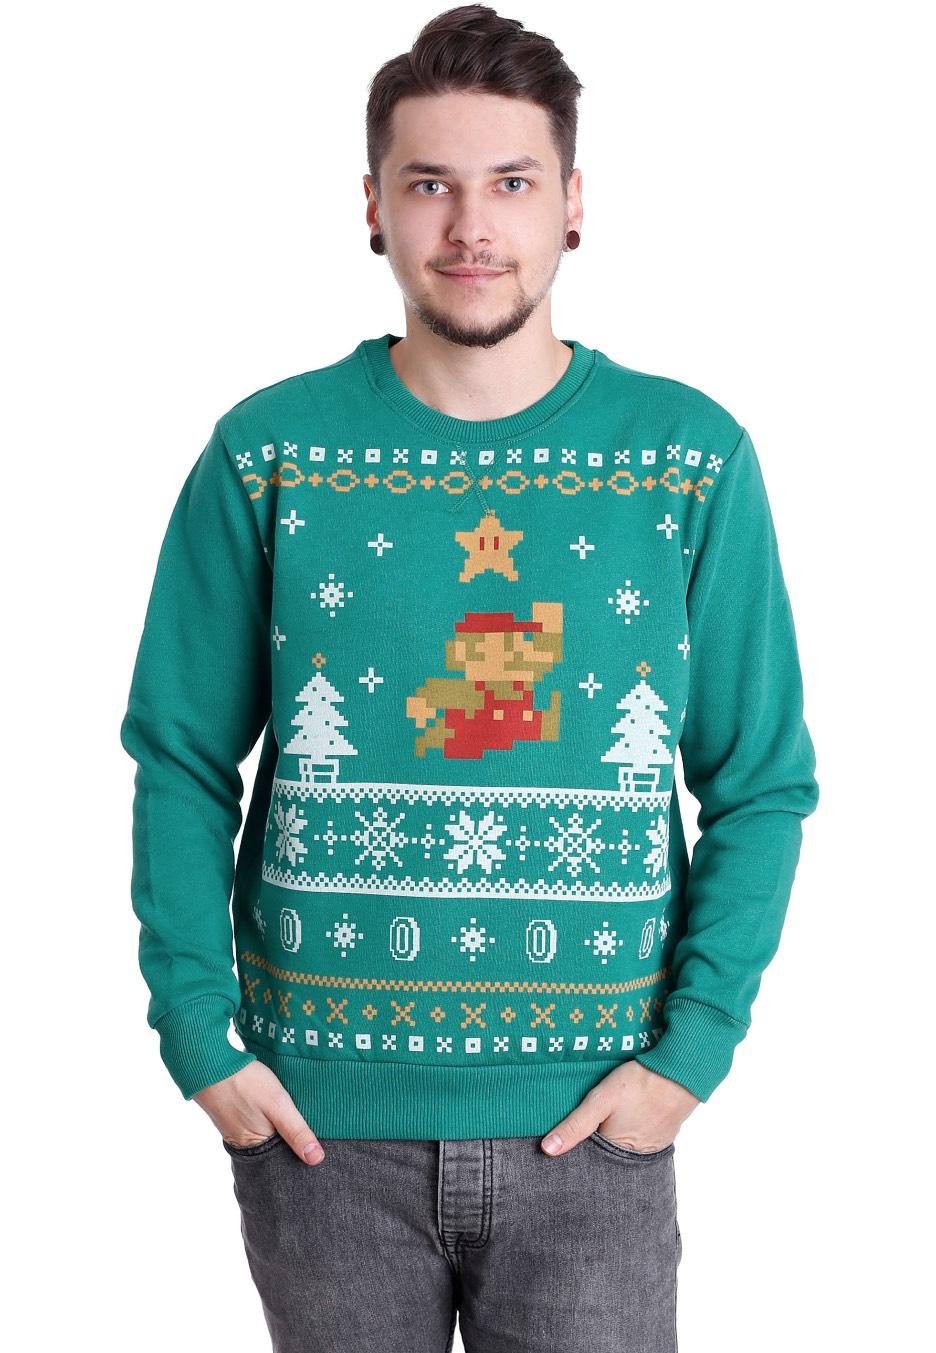 Super Mario - Jumping Mario Christmas Green - Sweater - Impericon ...